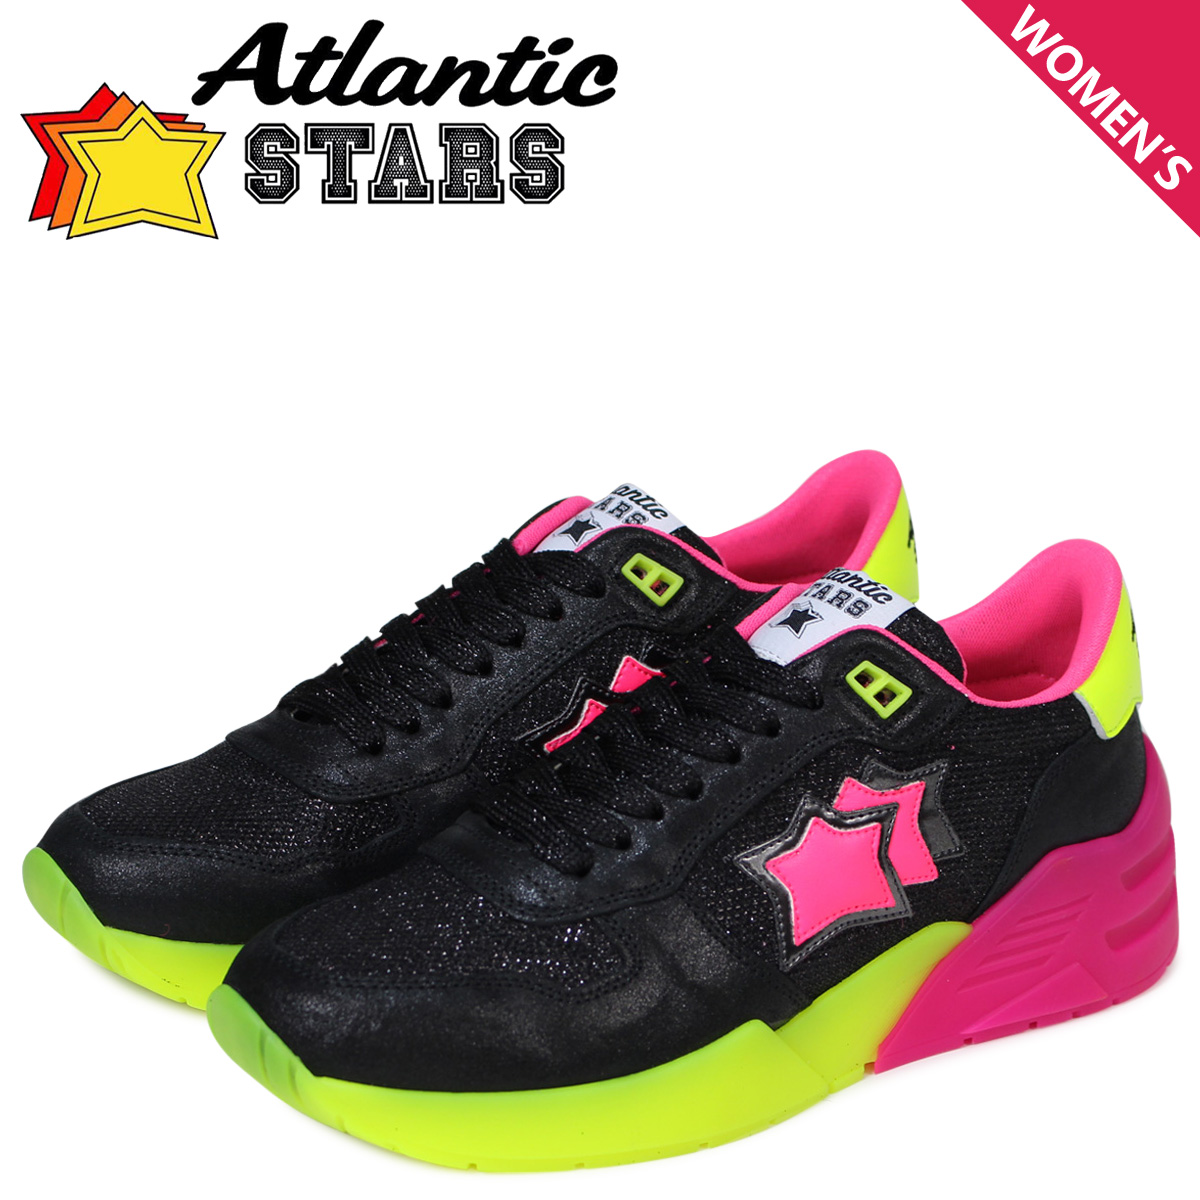 Atlantic STARS レディース スニーカー アトランティックスターズ ビーナス VENUS NB-SN05 ブラック 黒